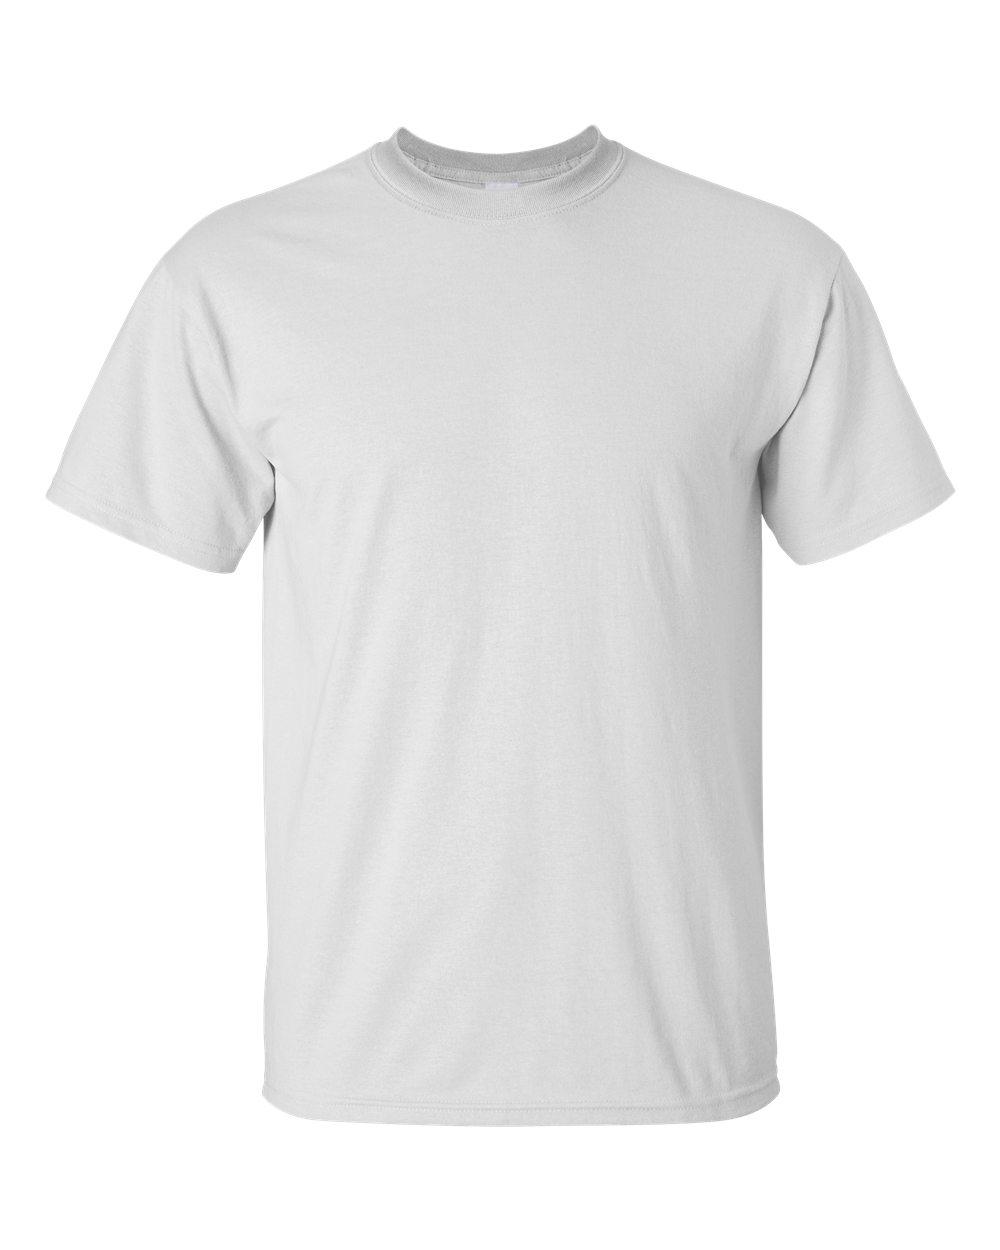 Mens Tall T Shirt